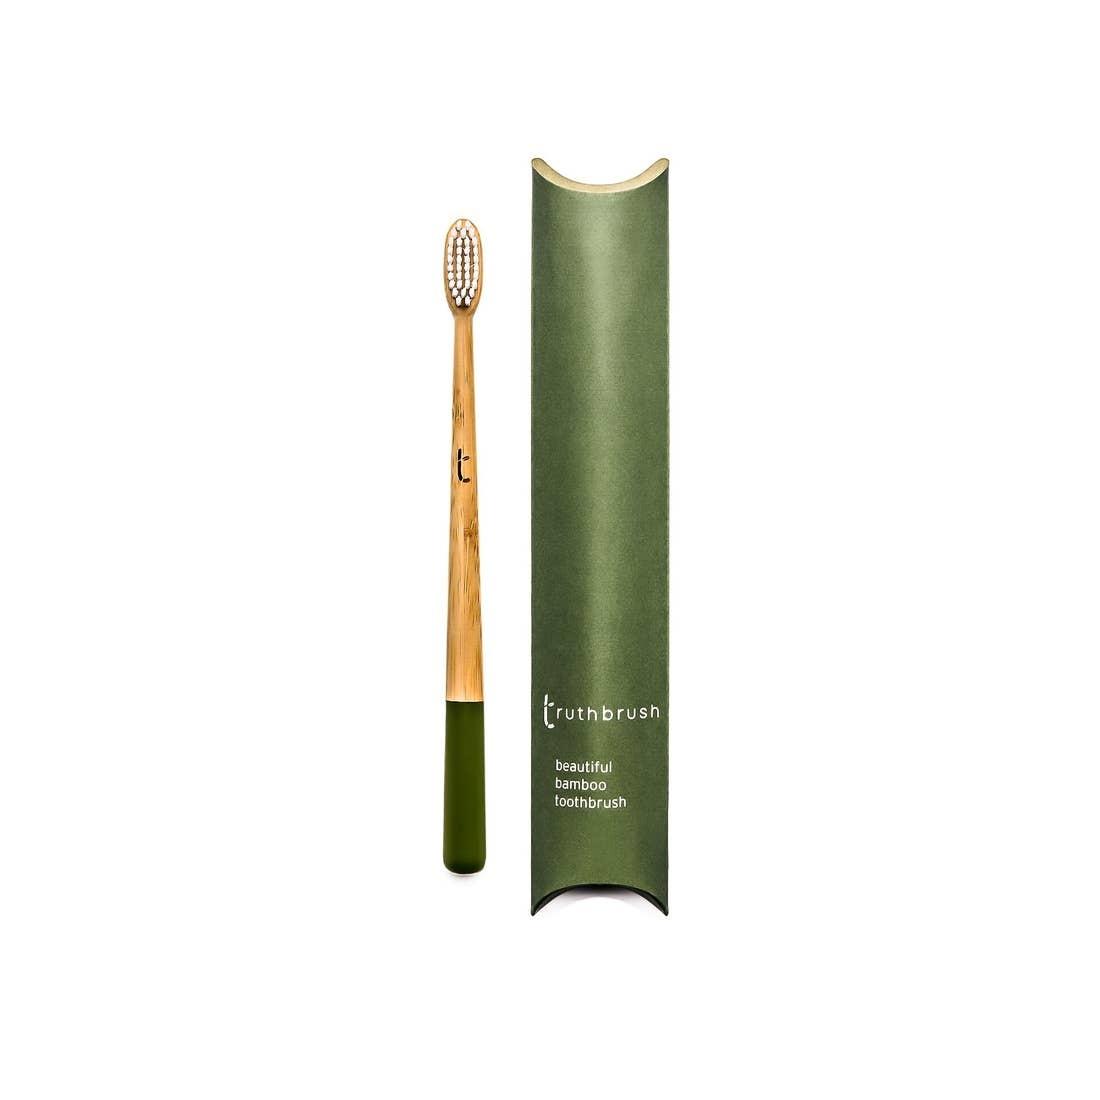 Truthbrush Ltd Bamboo Toothbrush  - Adult Medium Bristle  - Green